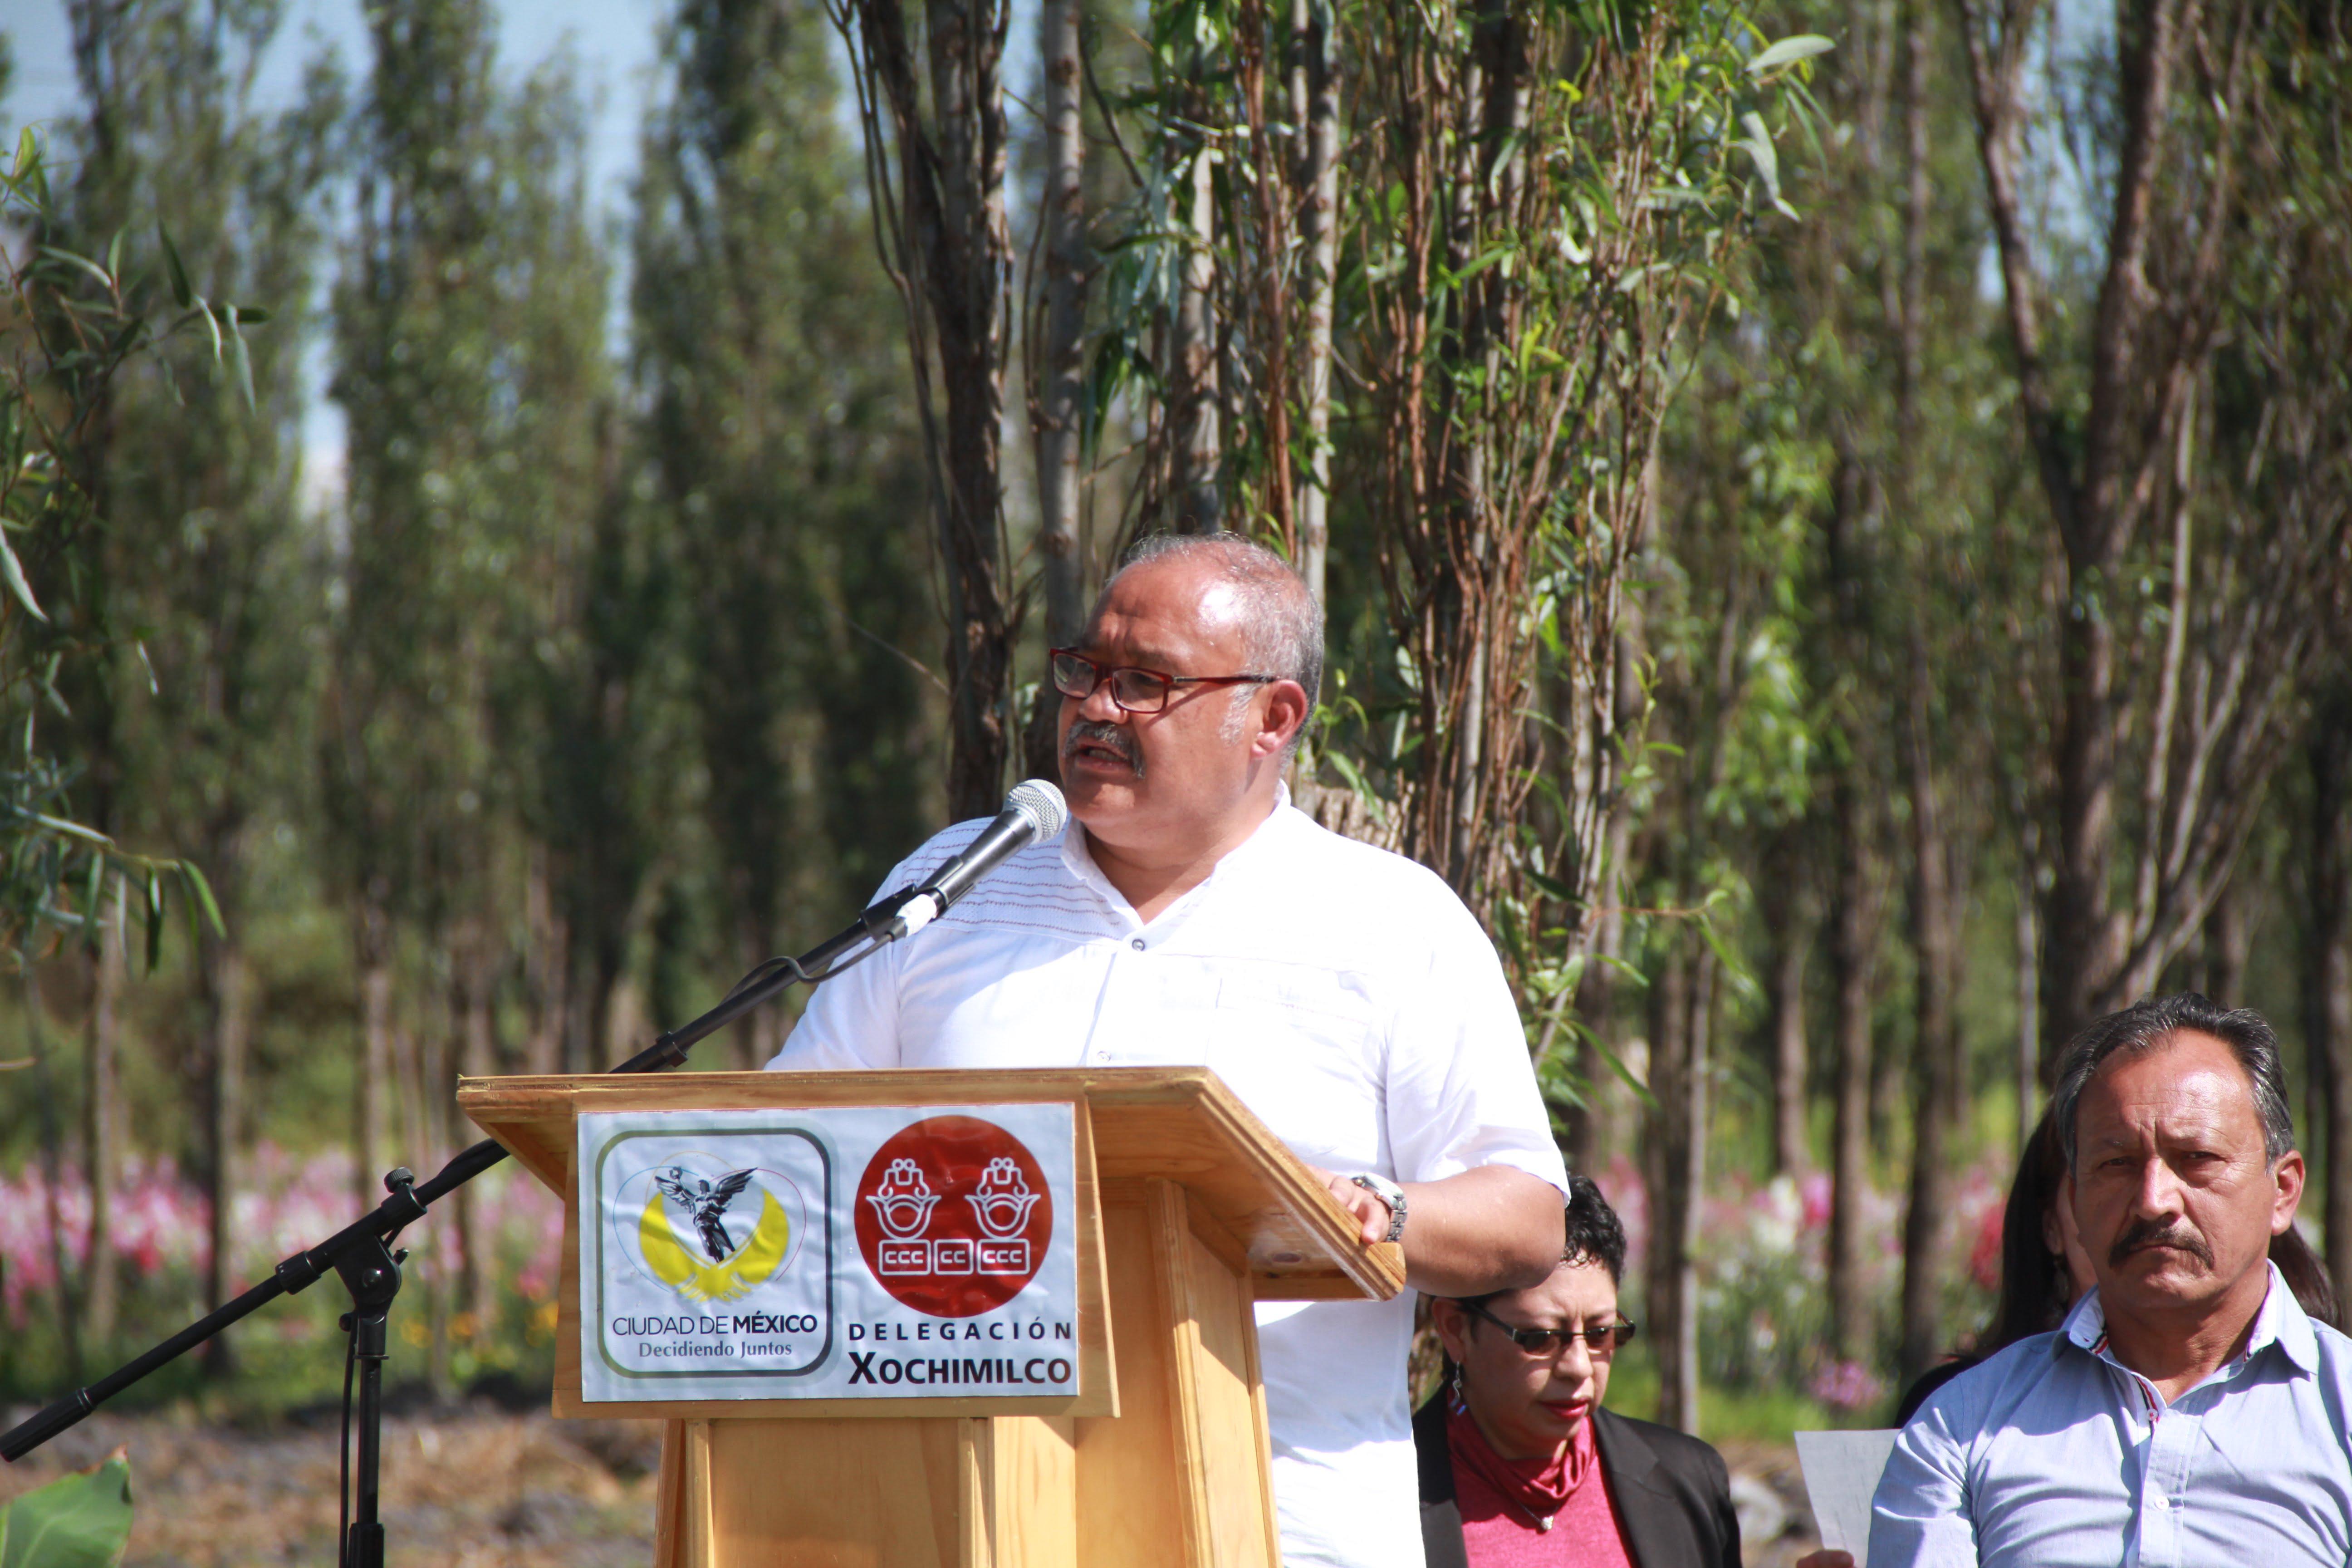 El delegado de Xochimilco clausuró la obra